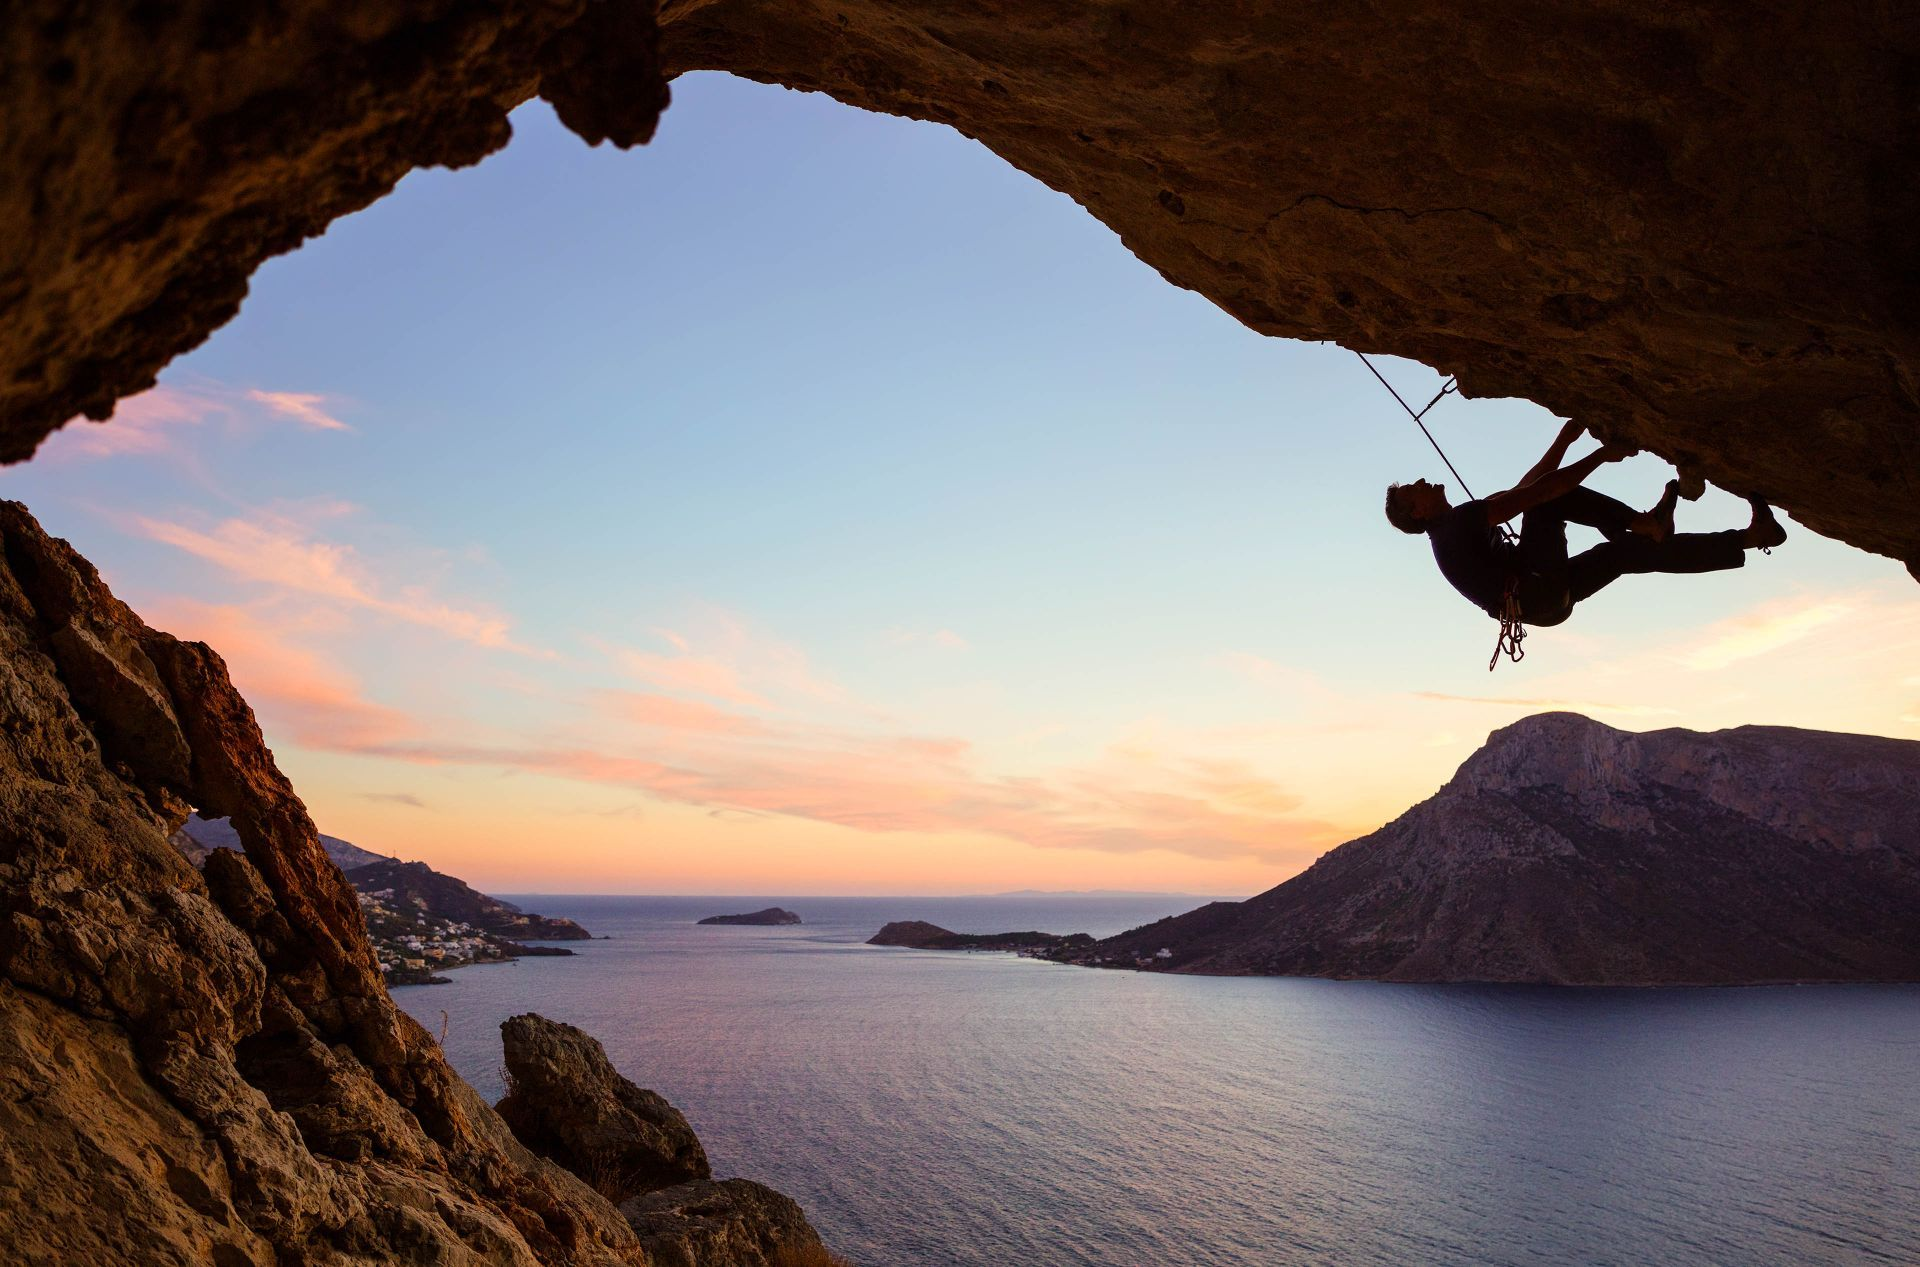 Kalymnos island: Climbing